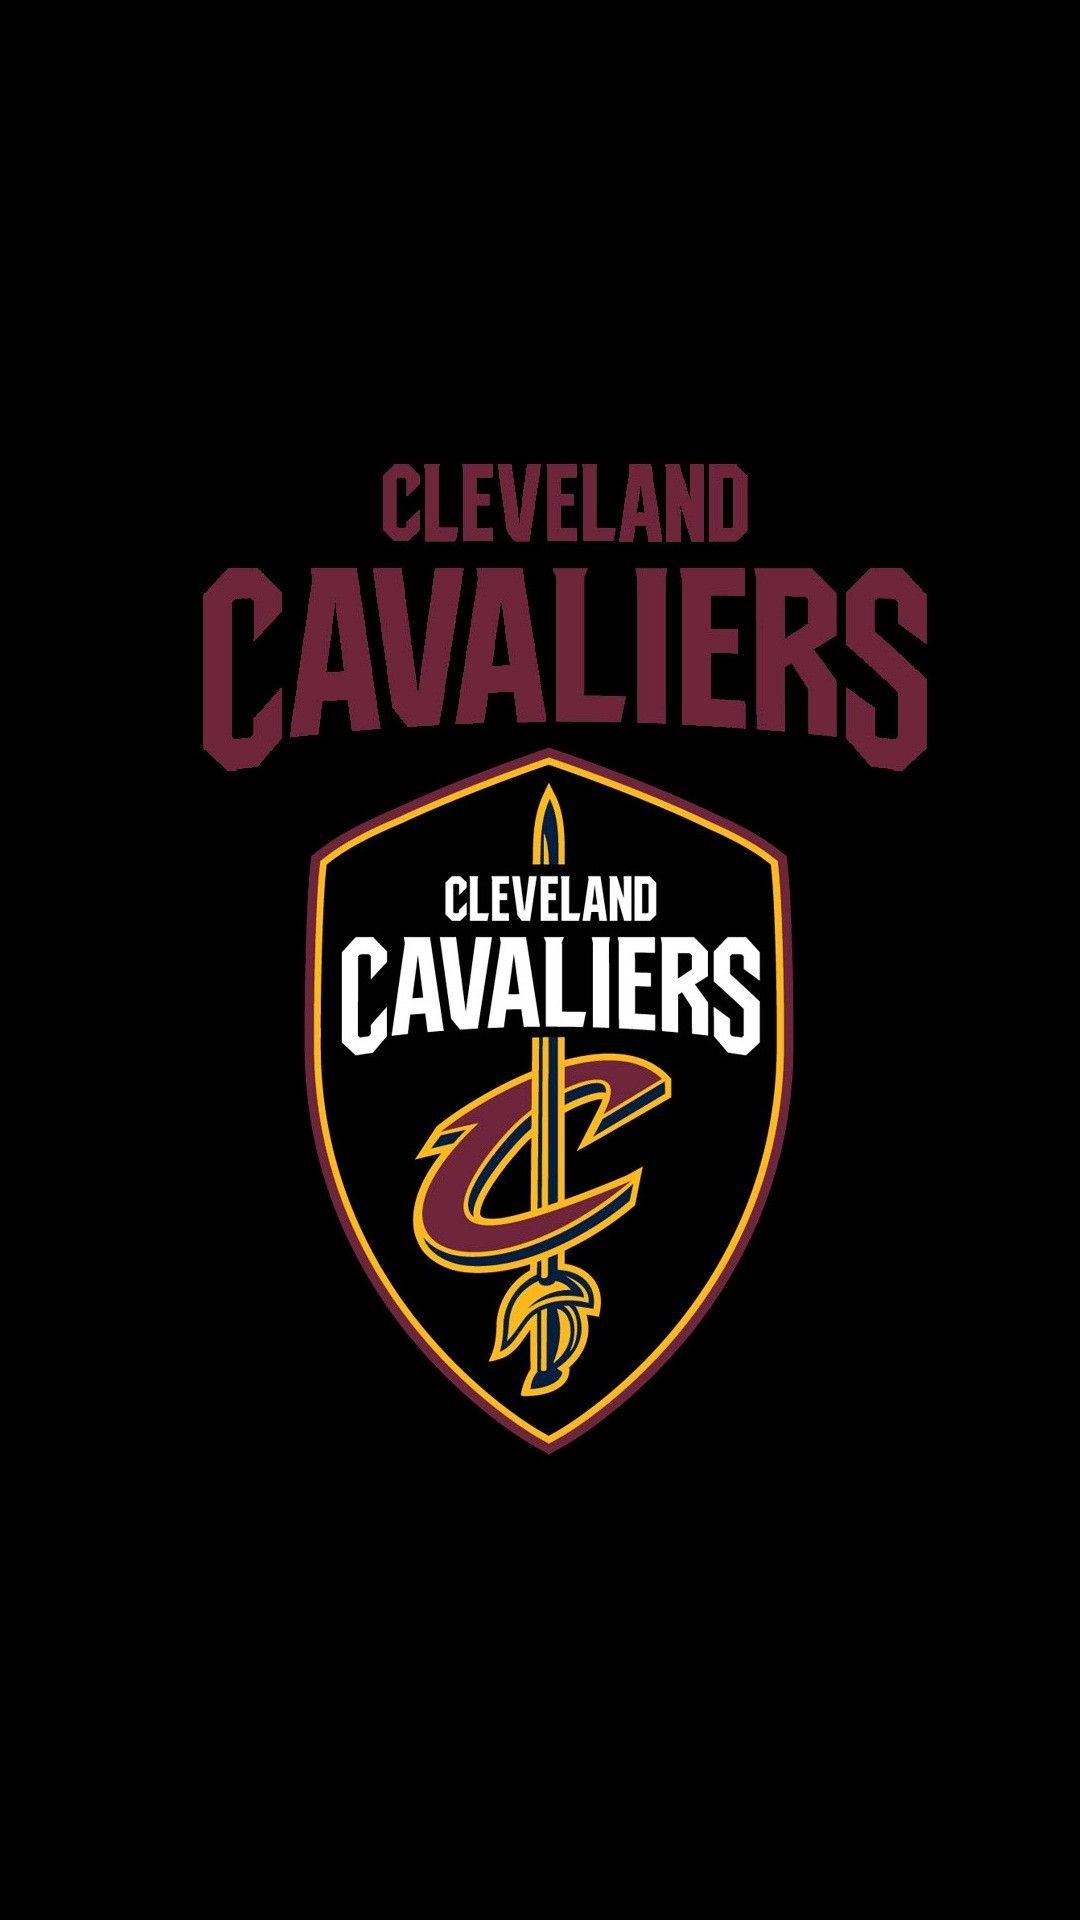 Cleveland Cavaliers Nba Wallpaper Iphone Hd 2021 Basketball Wallpaper Cavaliers Nba Basketball Wallpaper Nba Wallpapers